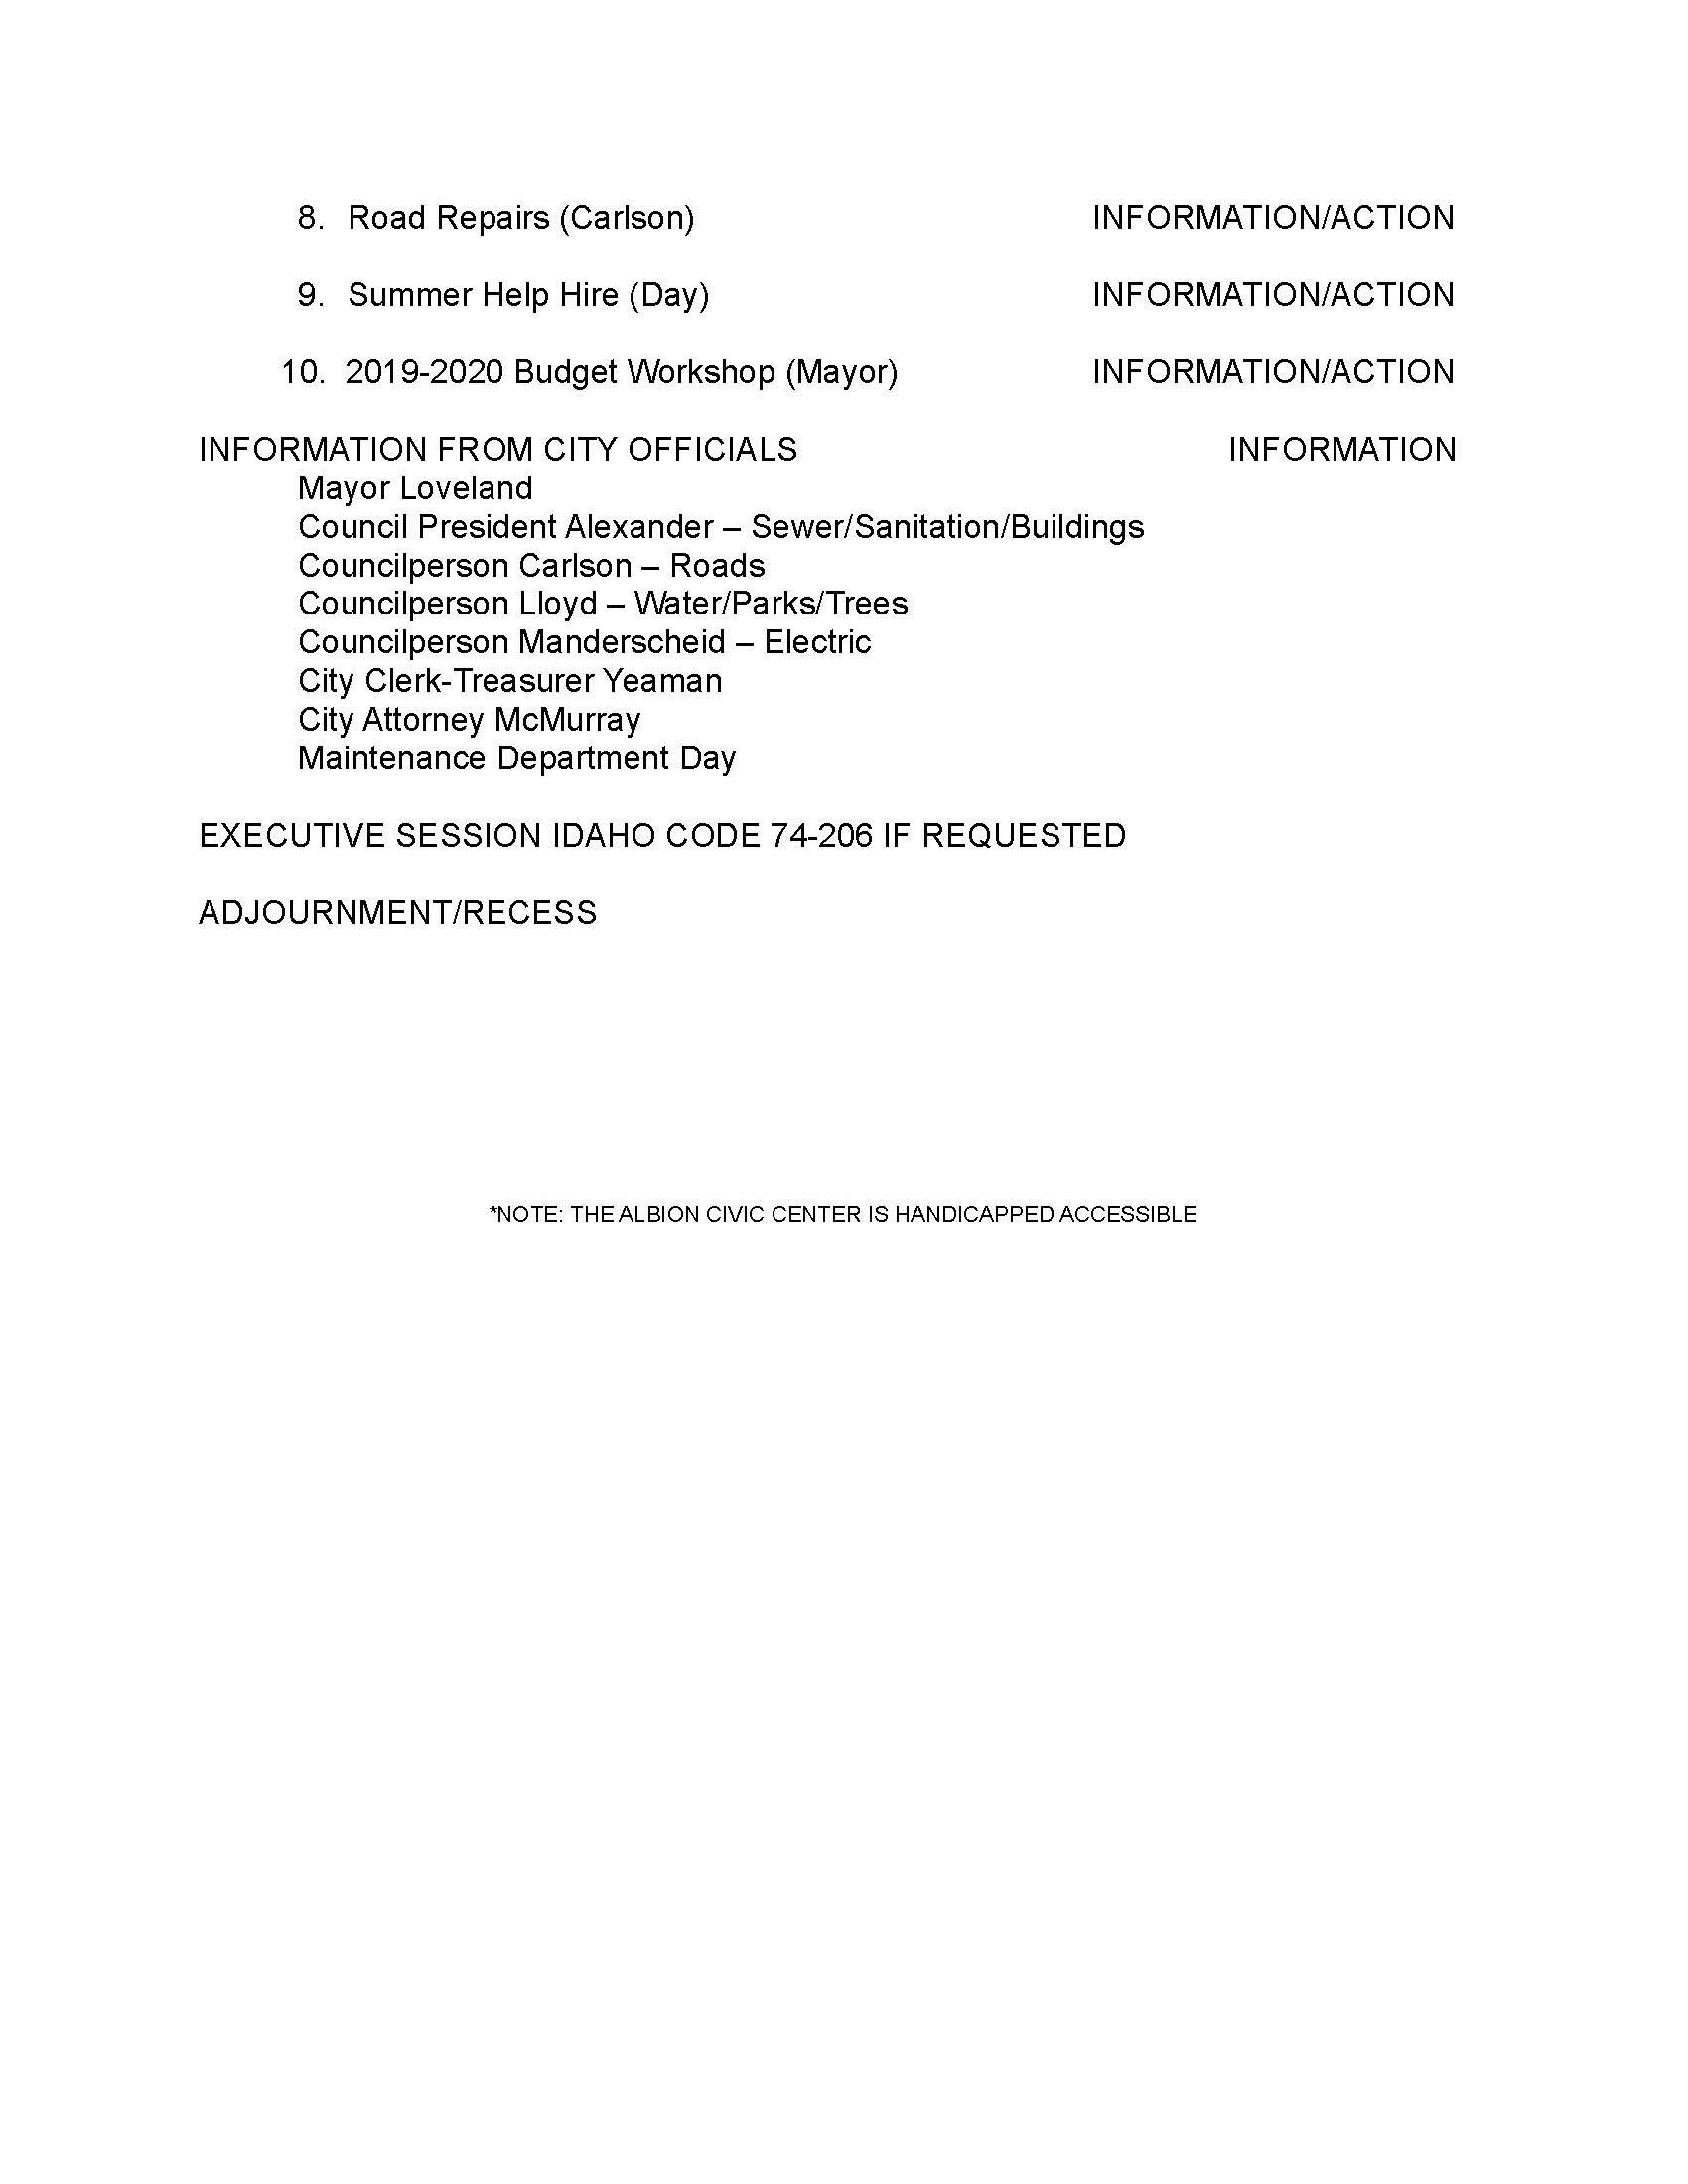 Agenda 05.09_Page_2.jpg